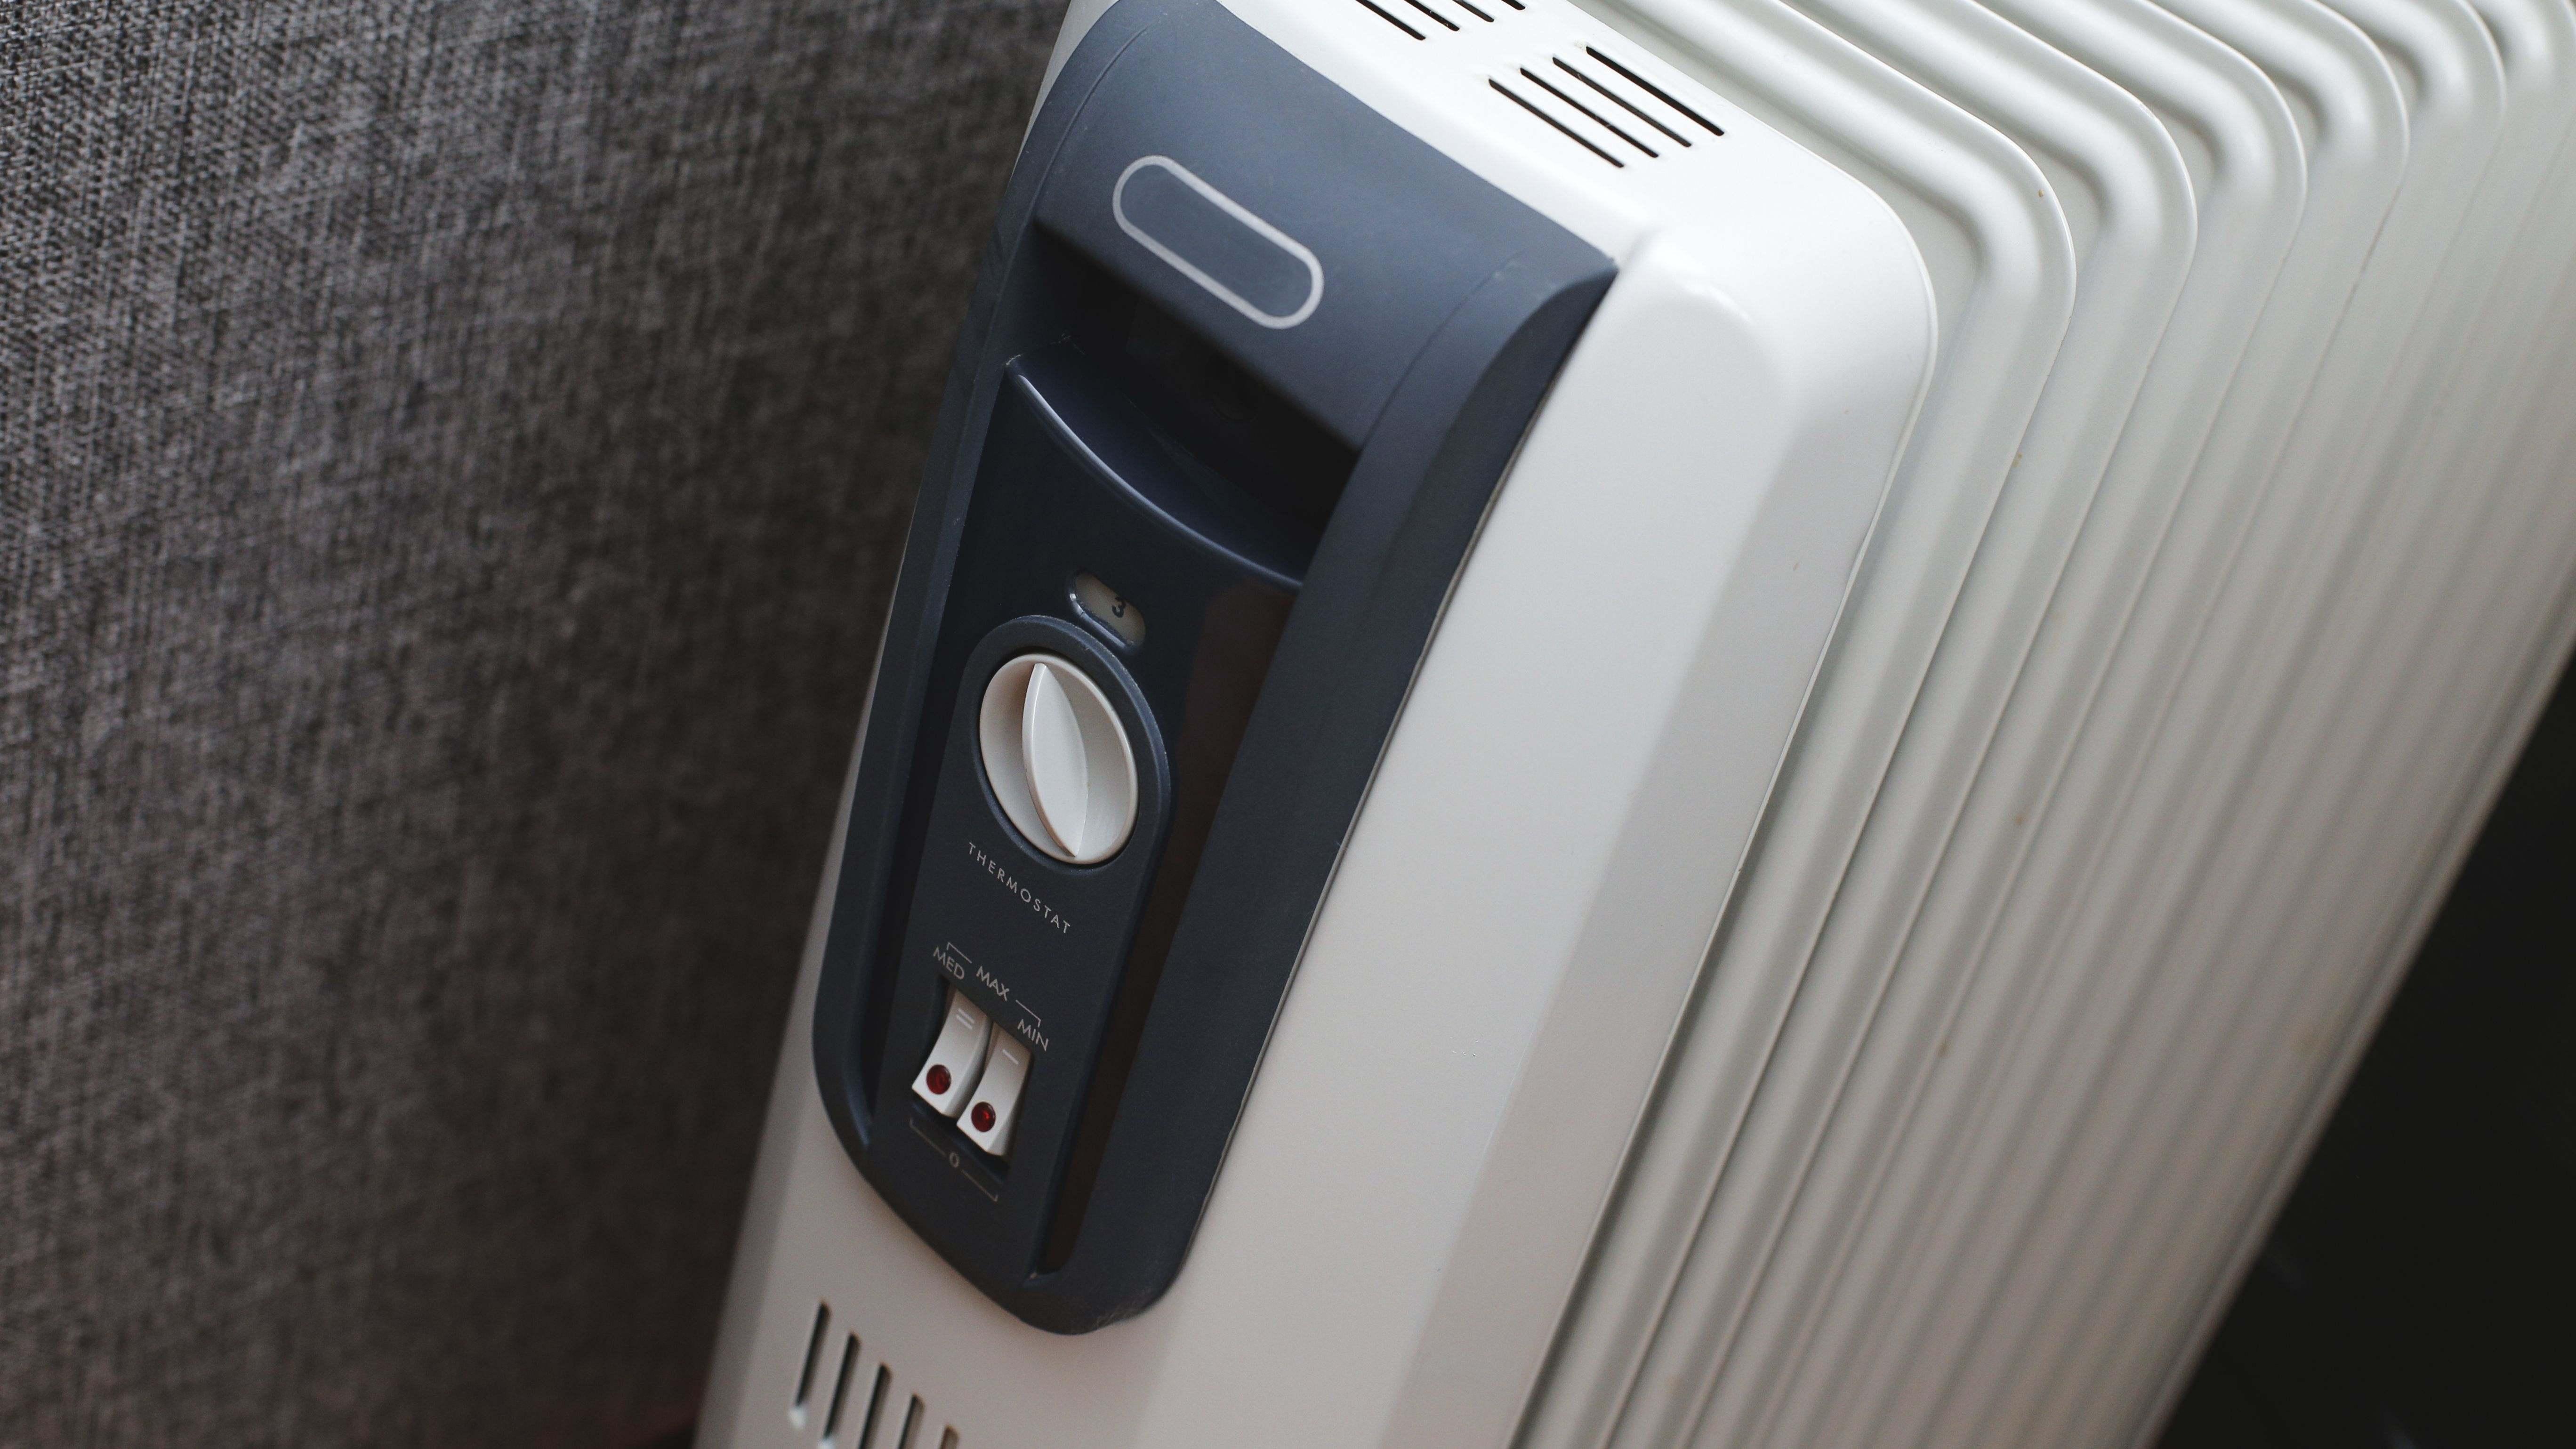 Bathroom heater buying guide